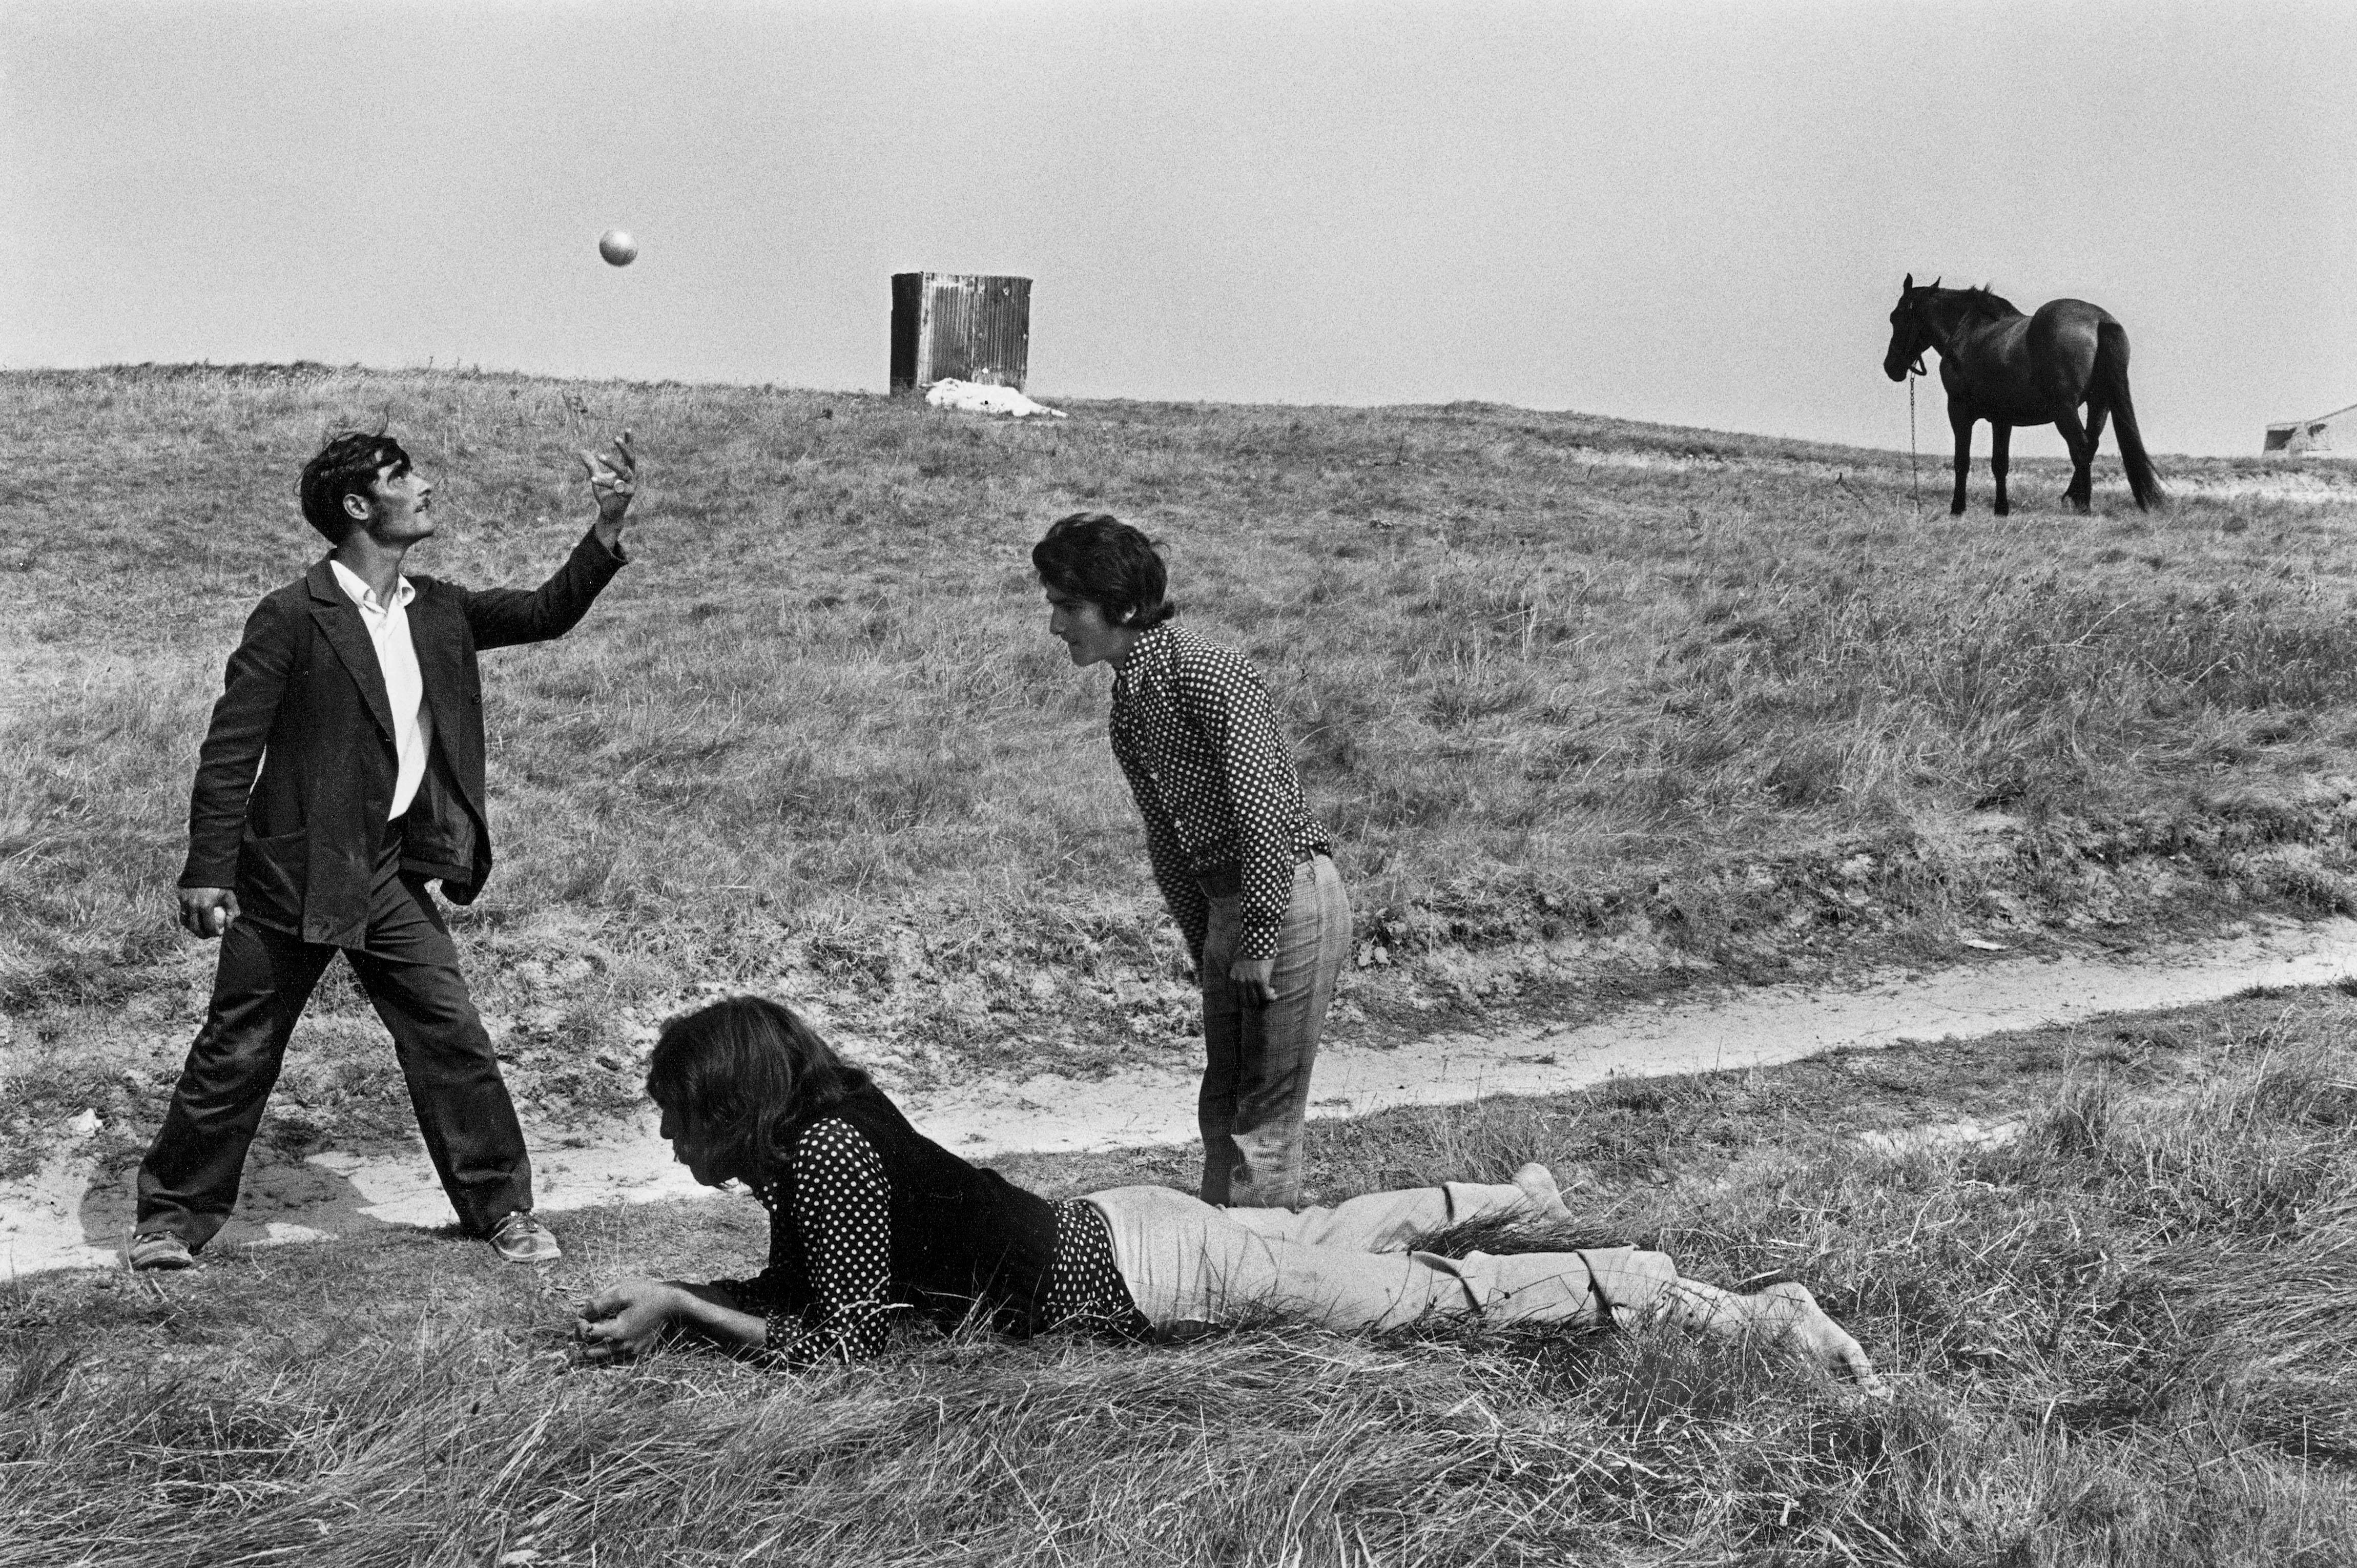 Josef Koudelka: Franciaország, 1973<br />© Josef Koudelka / Magnum Photos © Centre Pompidou